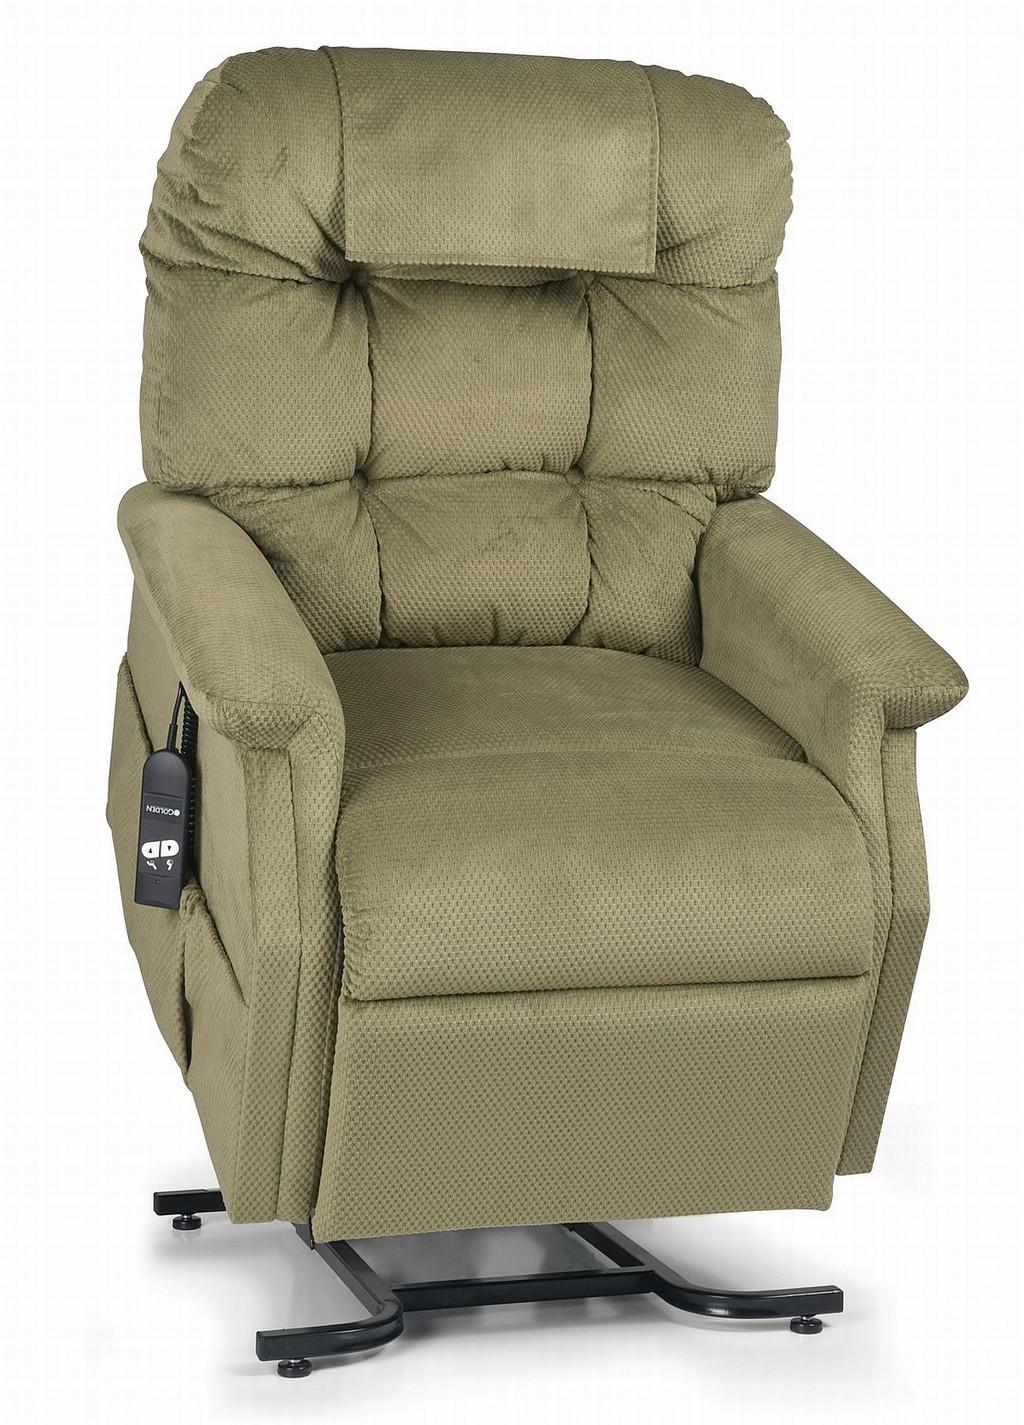 handicap lift chair recliner walmart rocking glider wheelchair assistance sealy